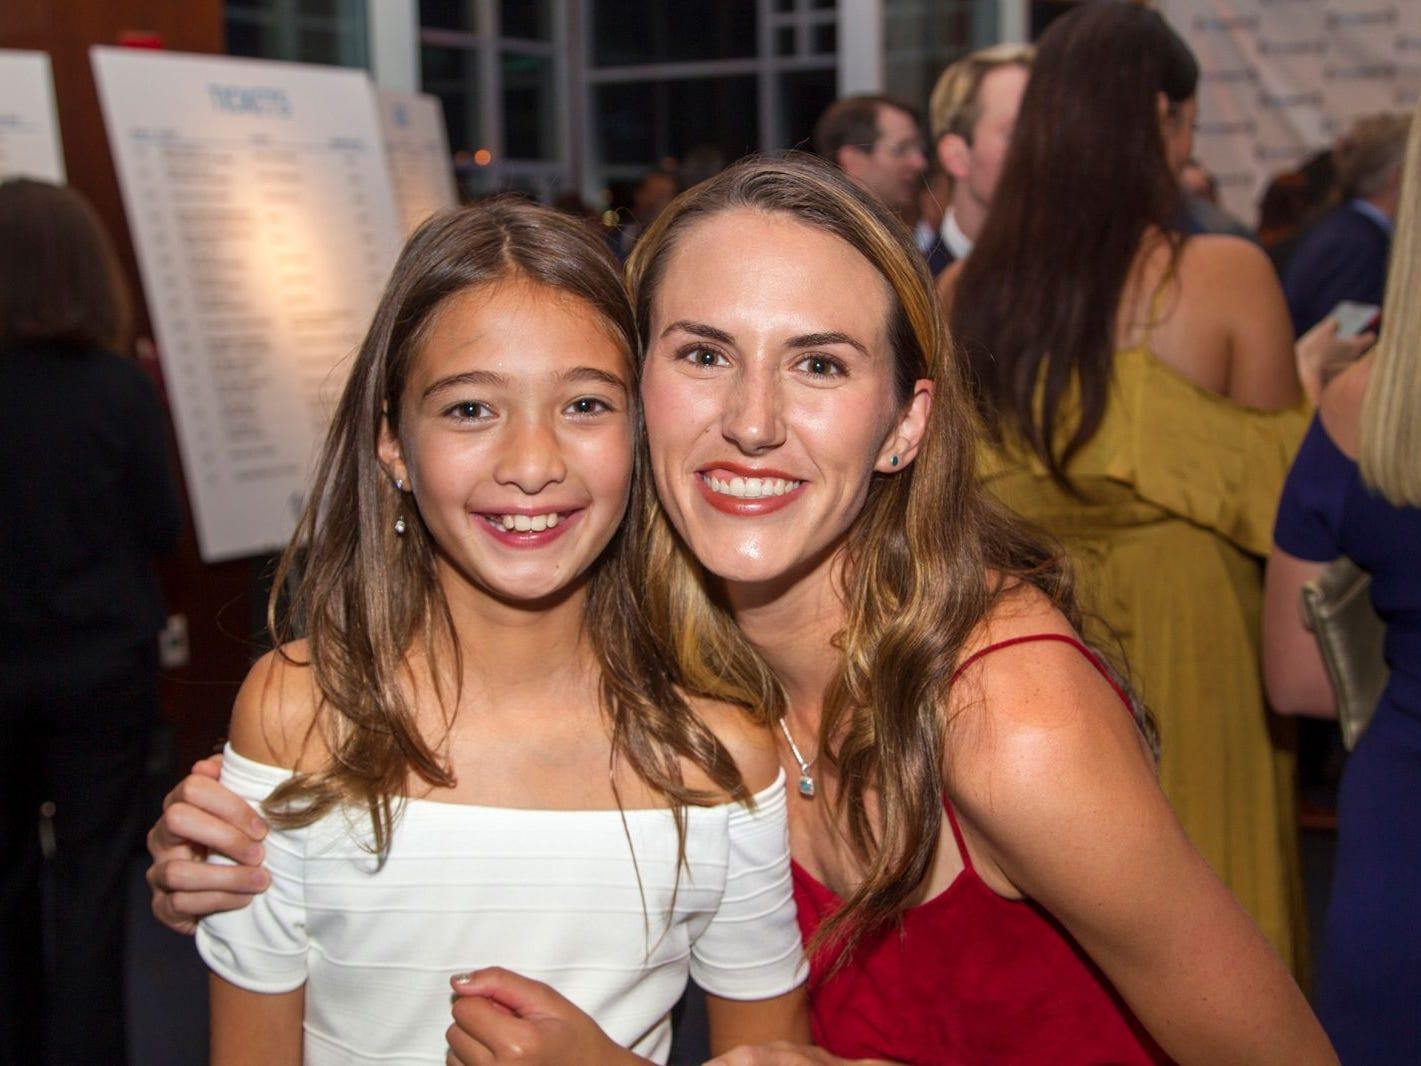 Ella, Nicole Kincade. 11th annual IronMatt Fundraiser Gala at Pier 60 Chelsea Piers. 09/20/2018